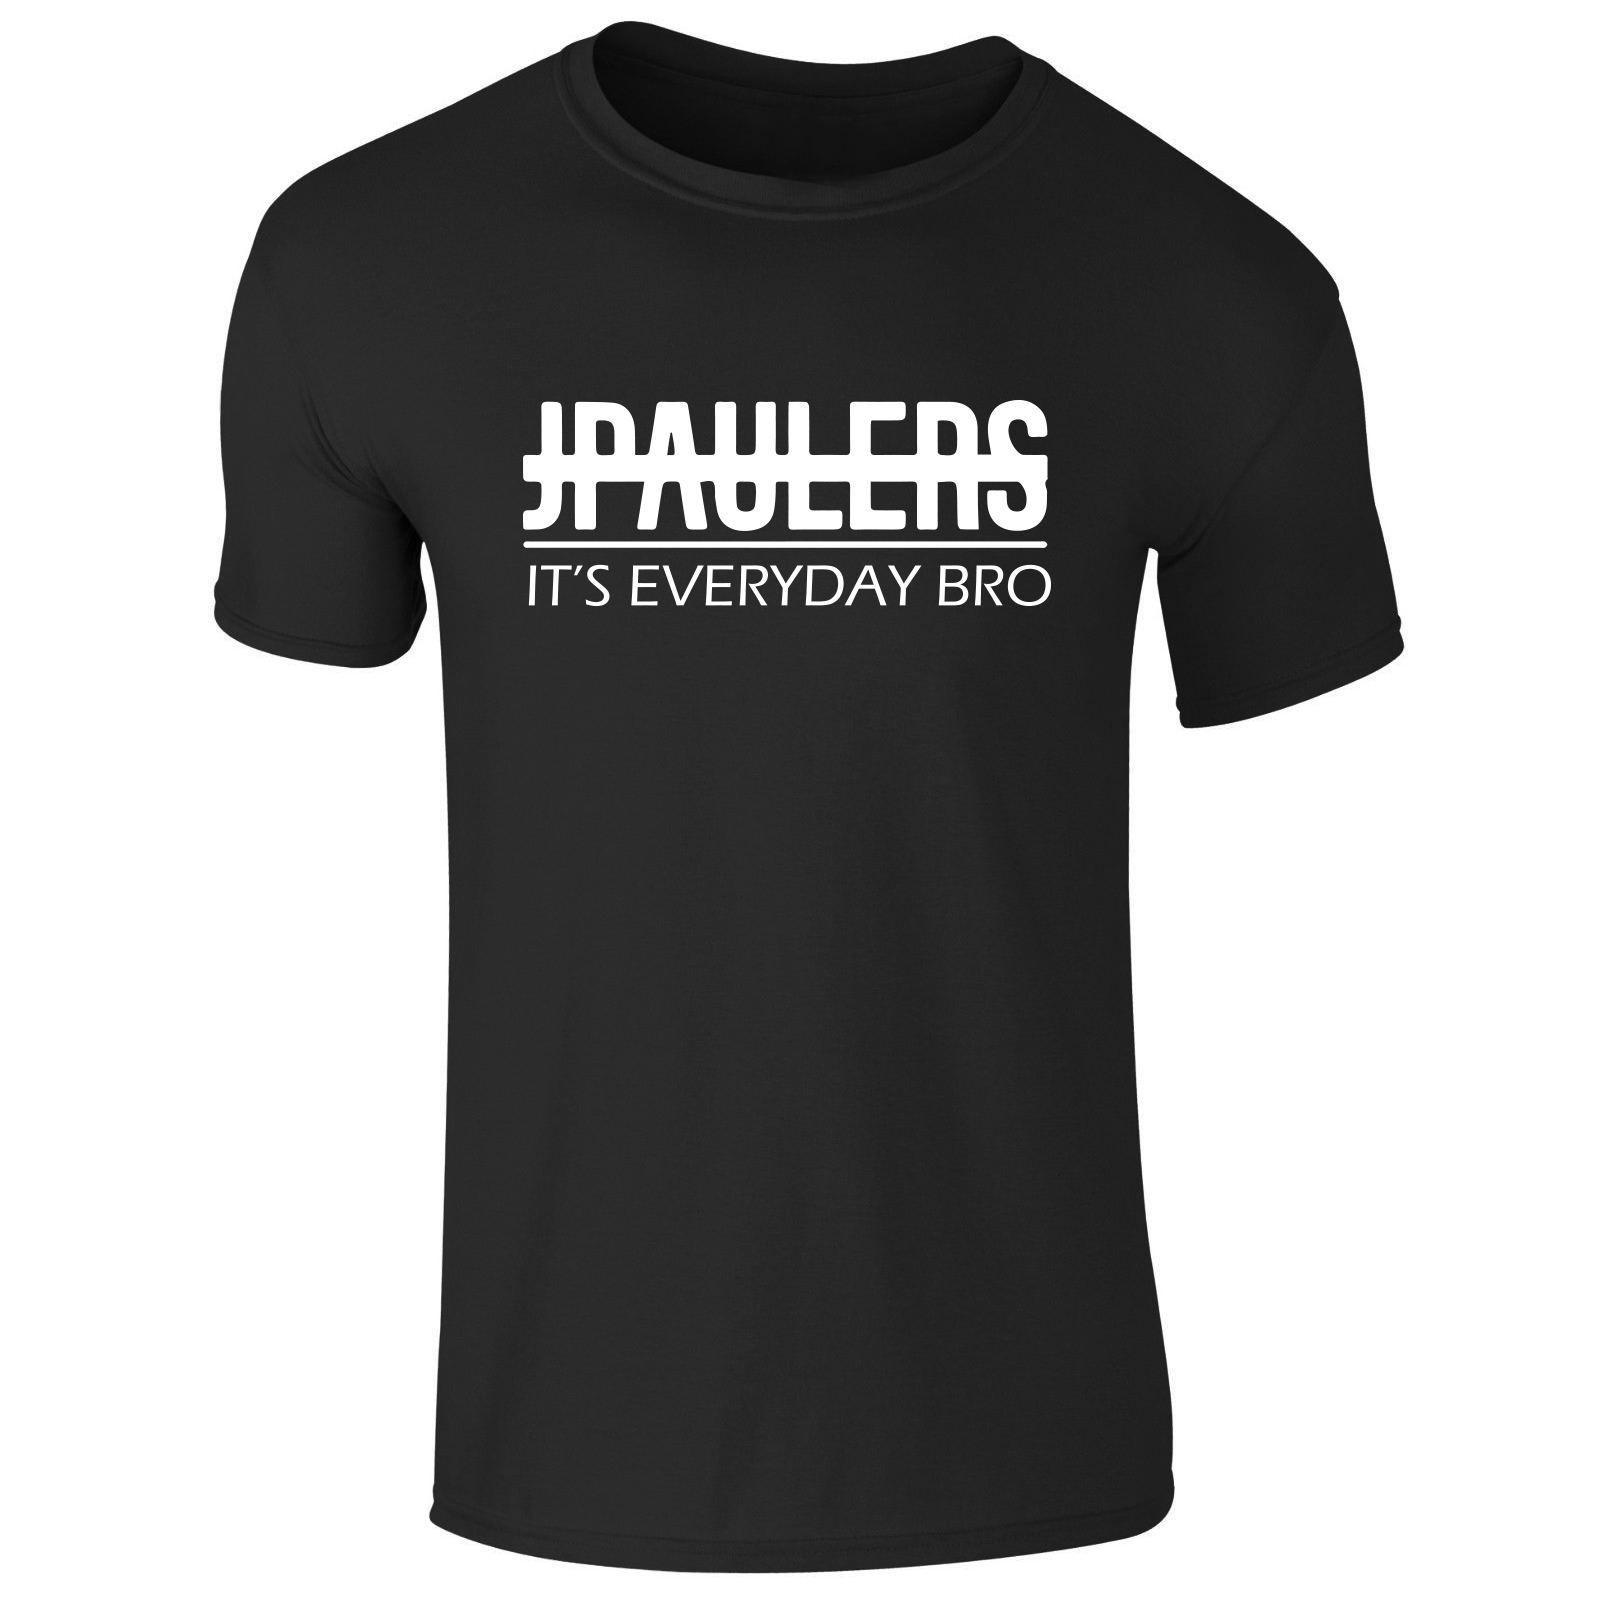 Jake Paul JPAULERS ITS EVERYDAY BRO Youtuber Logan Paul Team 10 T Shirt Top  Tee Pt Shirts Tourist Shirt From Crazylikeafawkes d6b642189